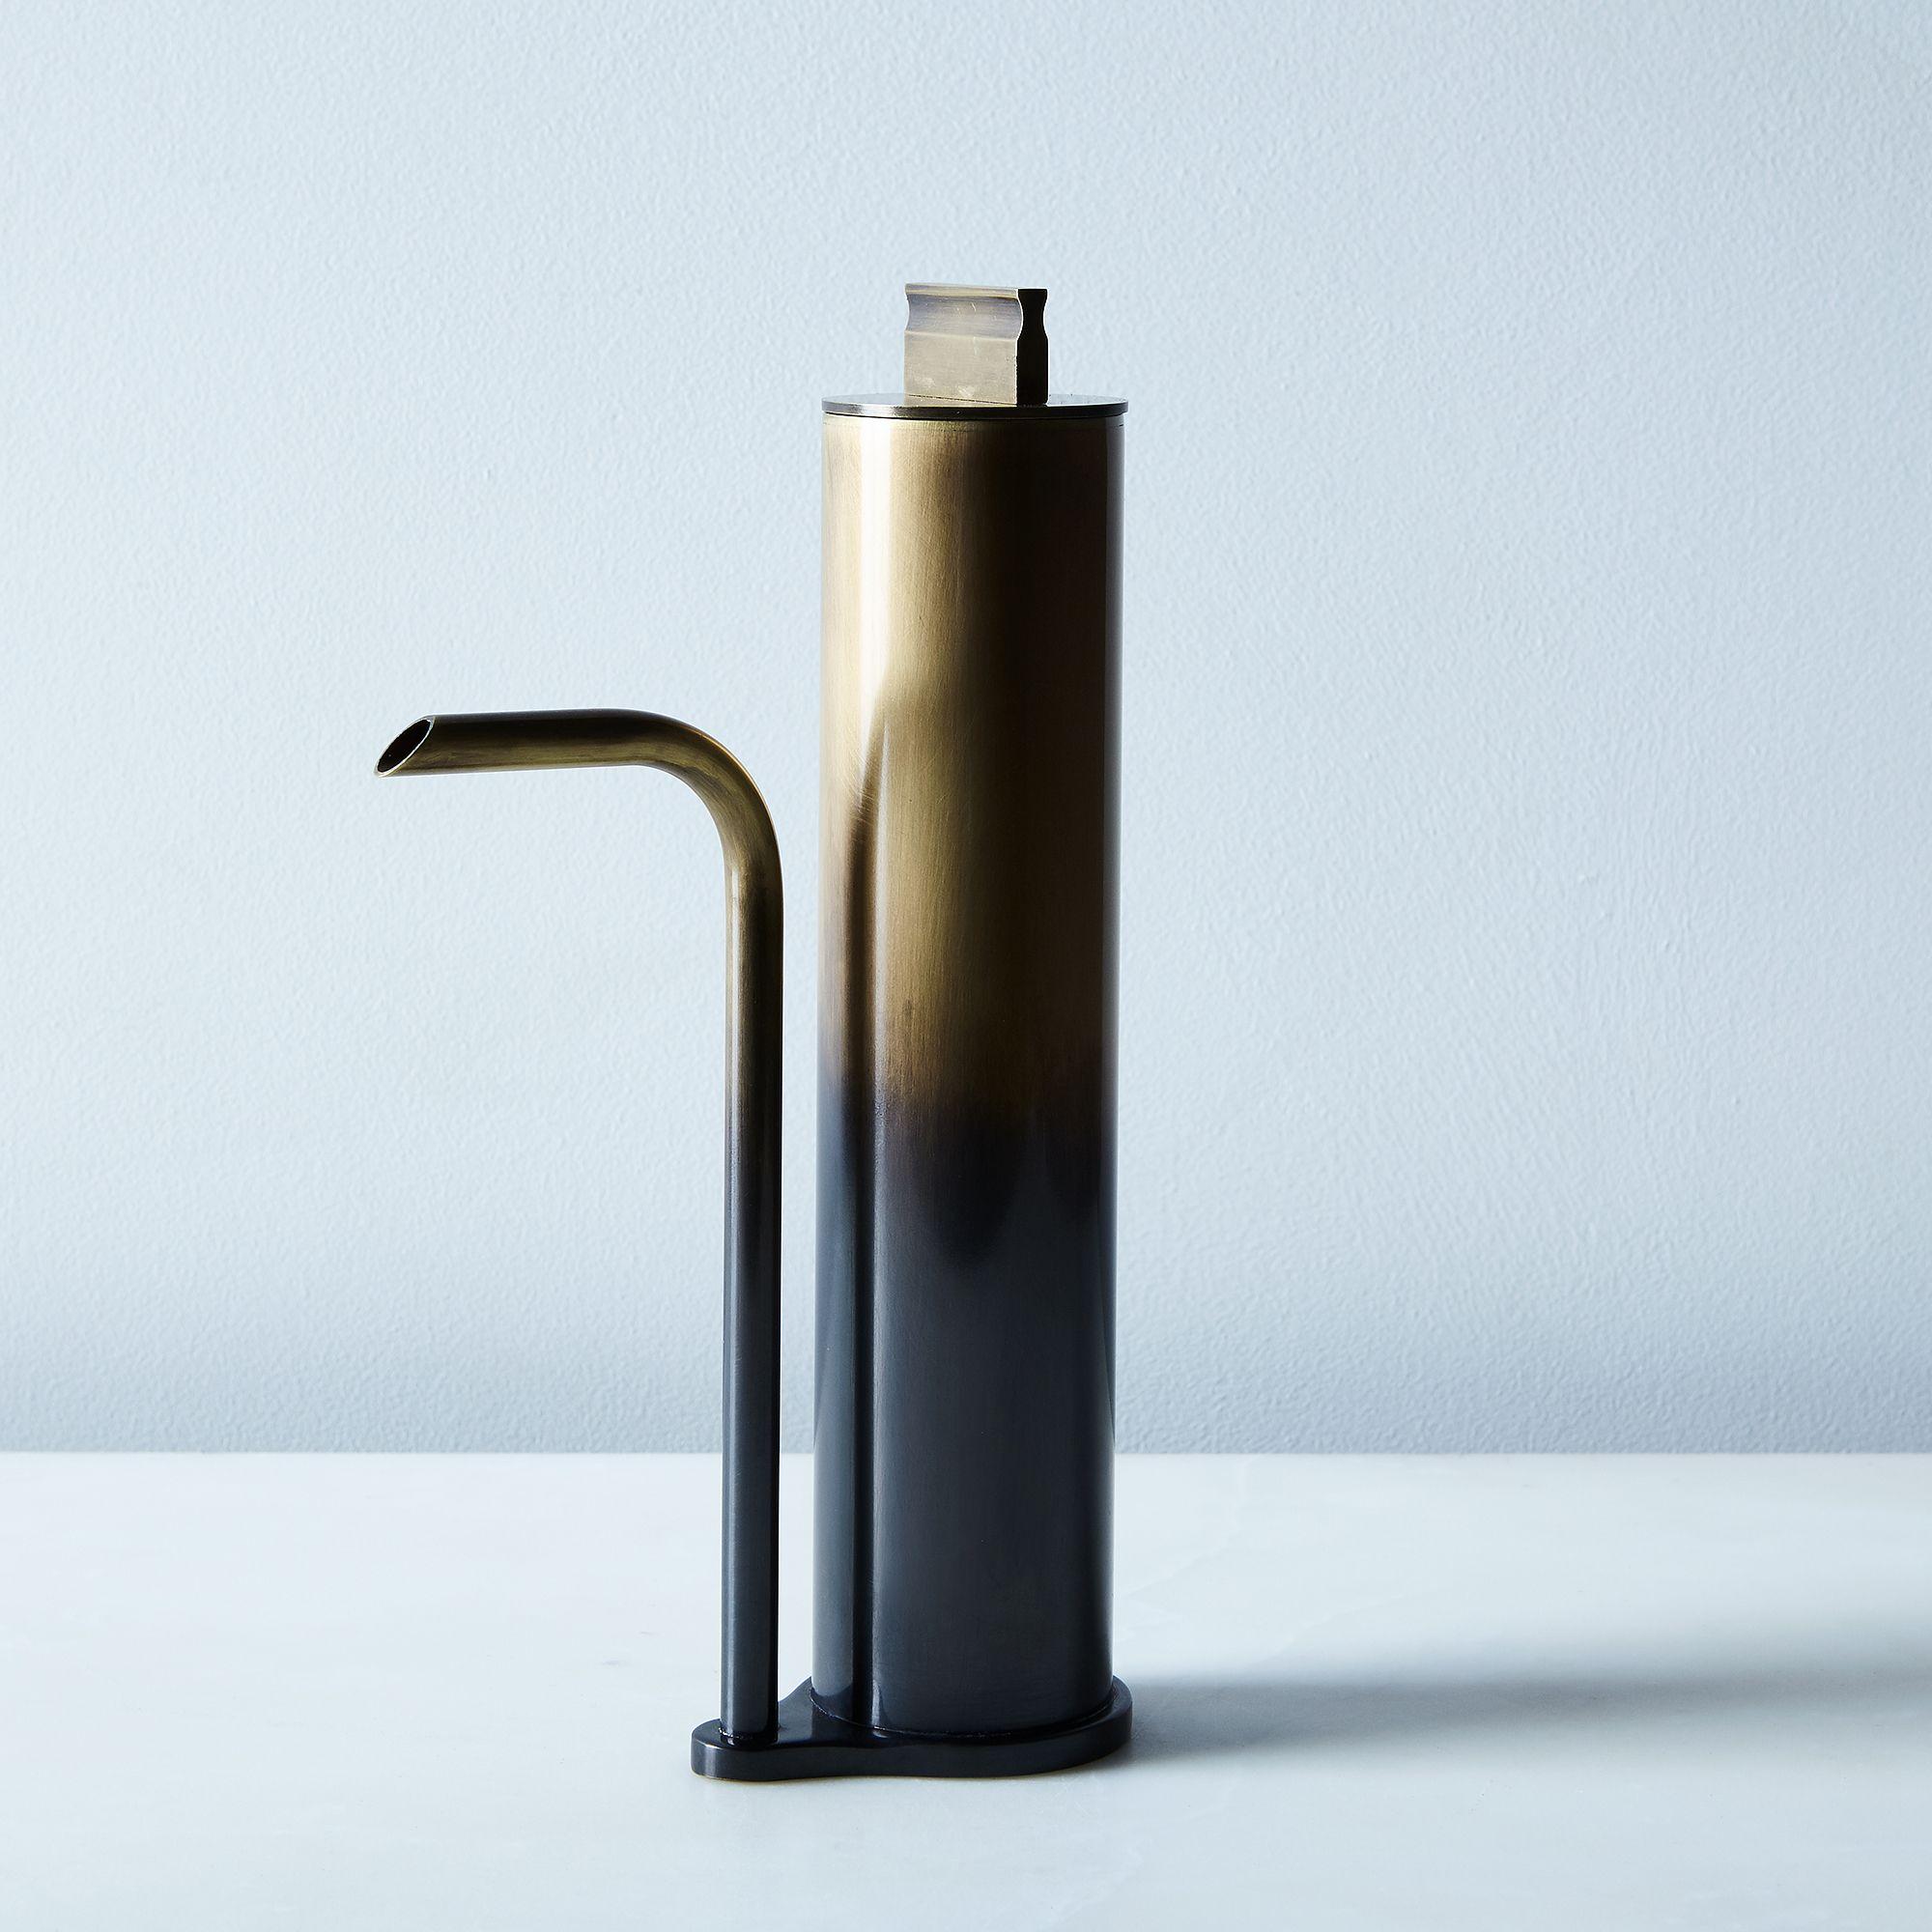 D9dacbf6 8012 469a b900 72cbe412ef3a  2016 1209 gentner oil decanter antiqued brass silo rocky luten 025